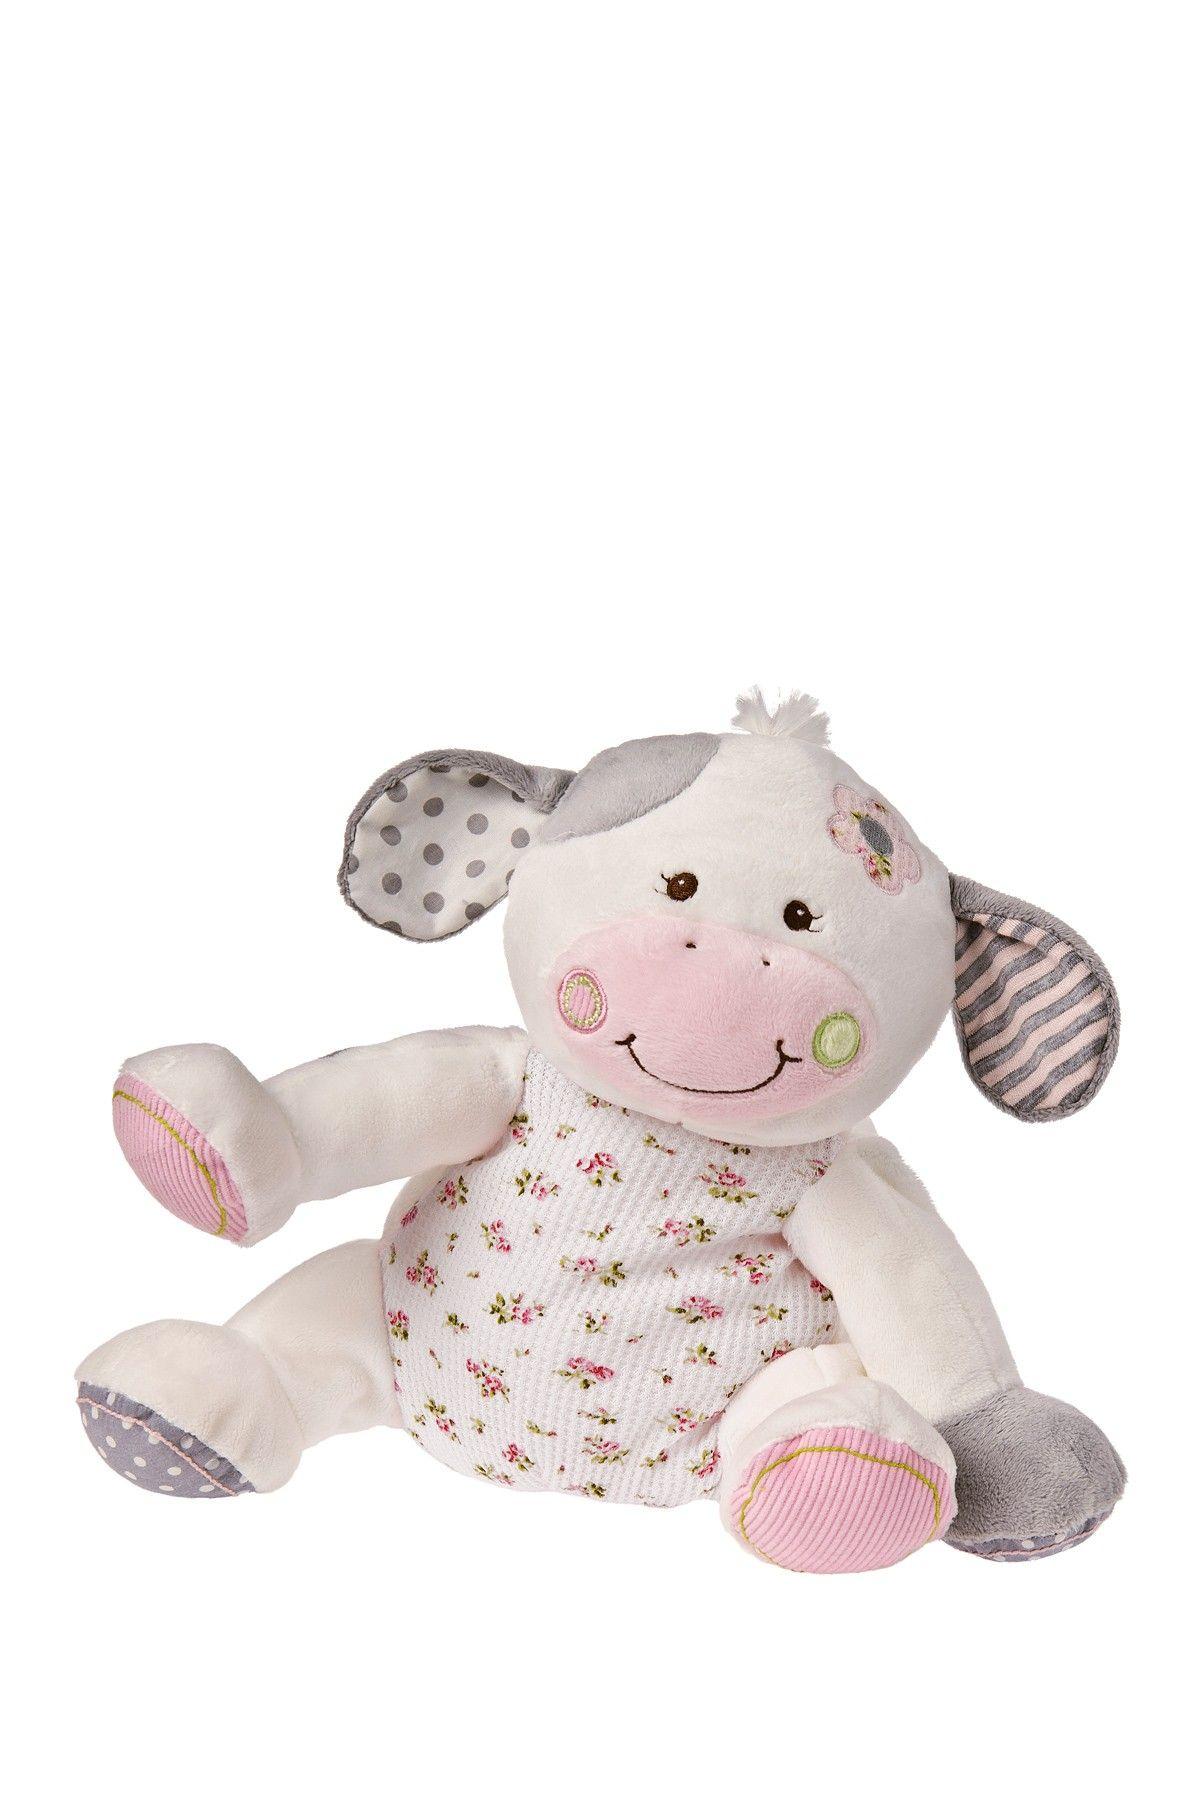 Baby Cheeks Moo Moo Cow Soft Toy 11 On Hautelook 1150 Babies